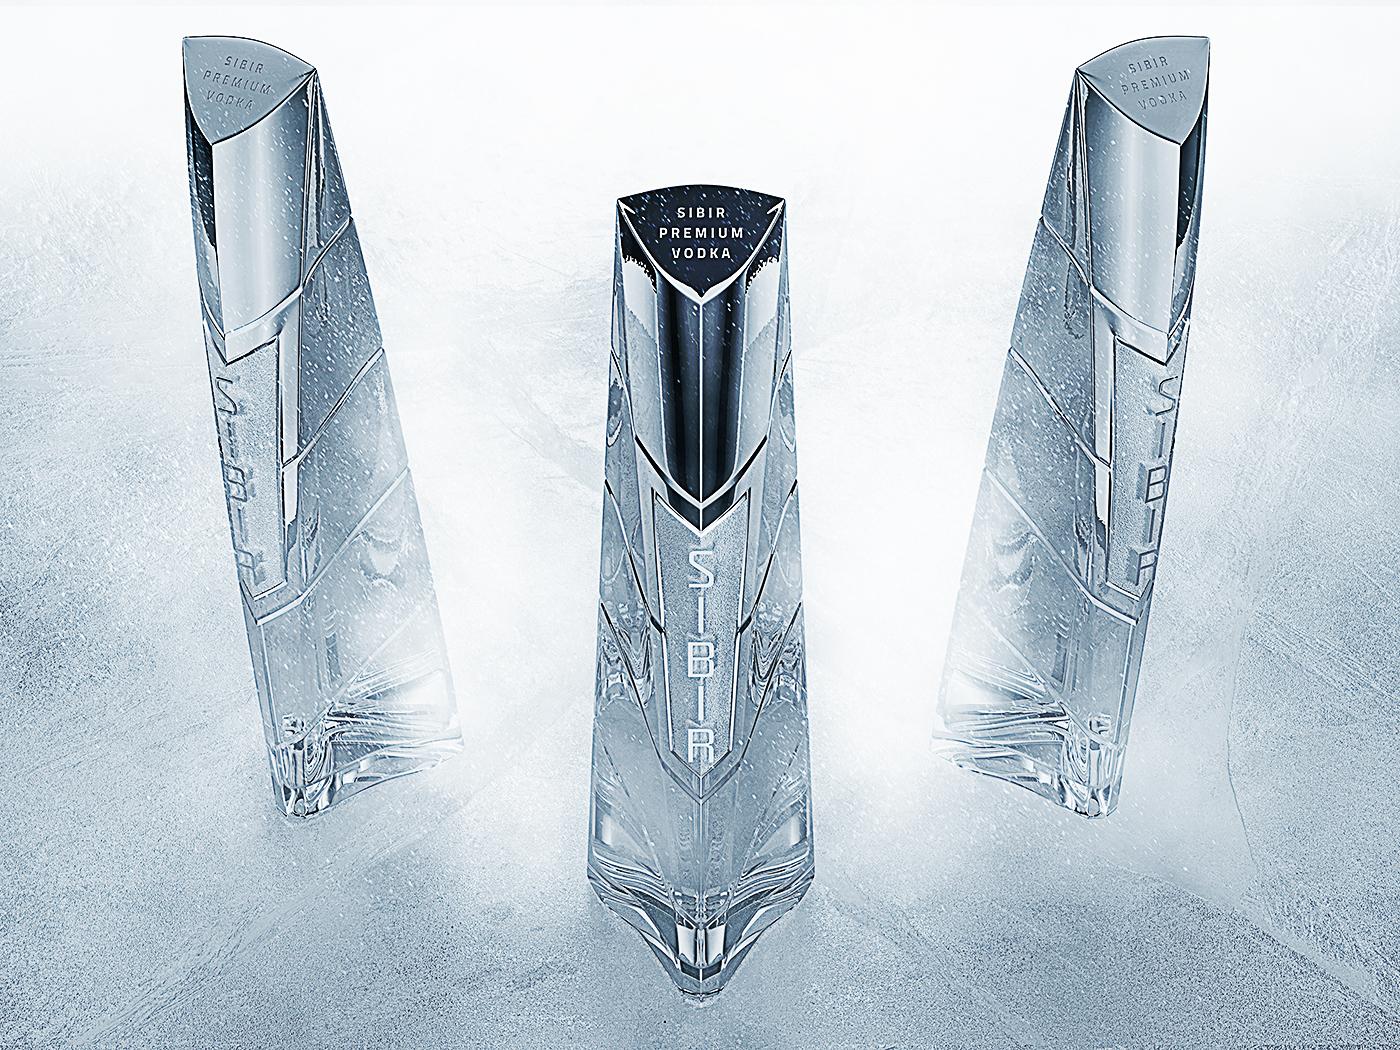 Sibir ultra premium luxury vodka 3.jpg